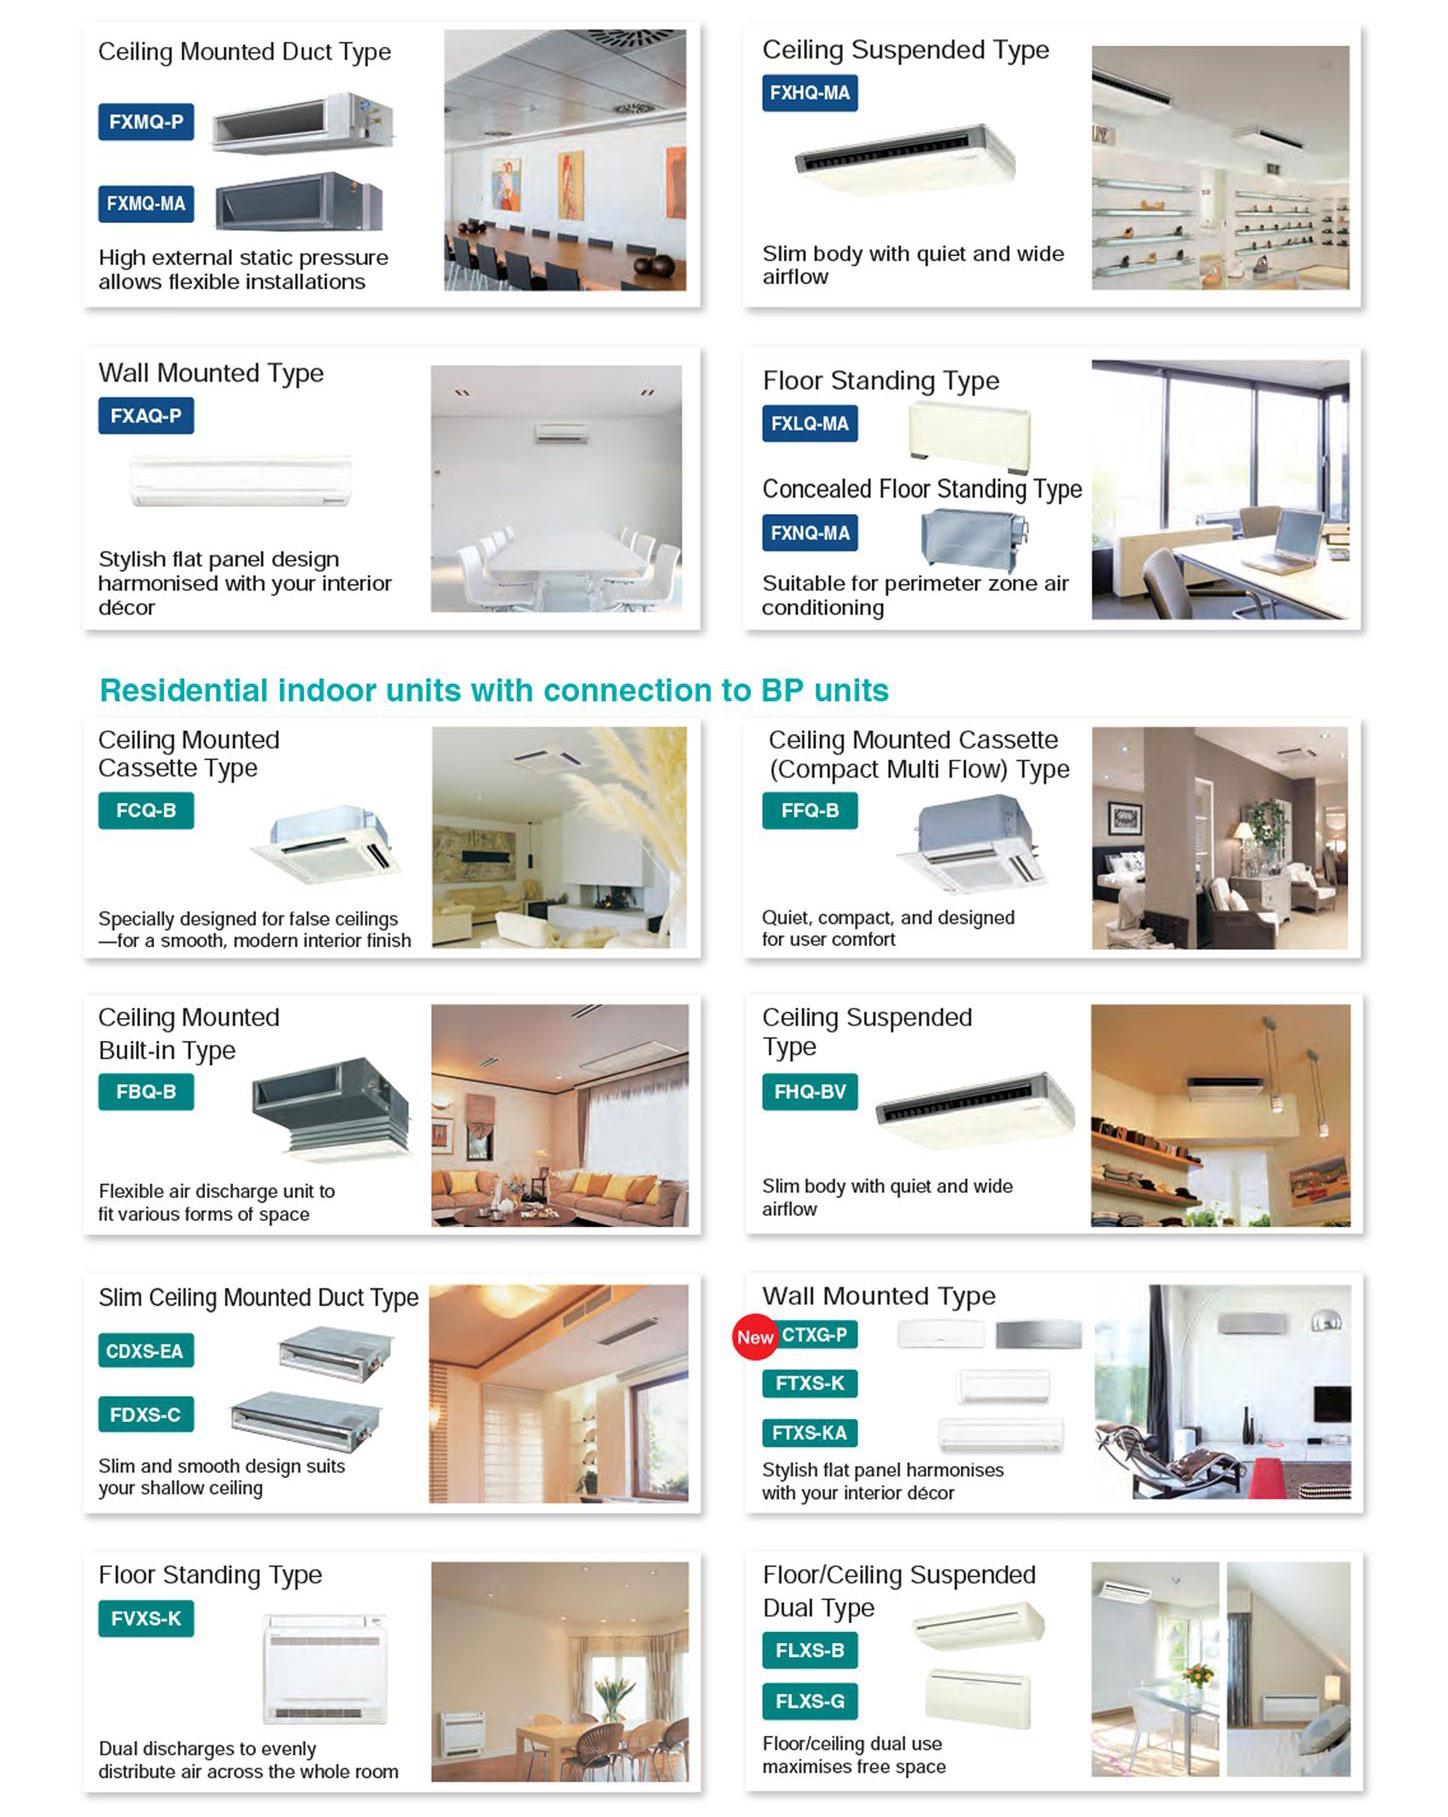 vrv-indoor-units2-1